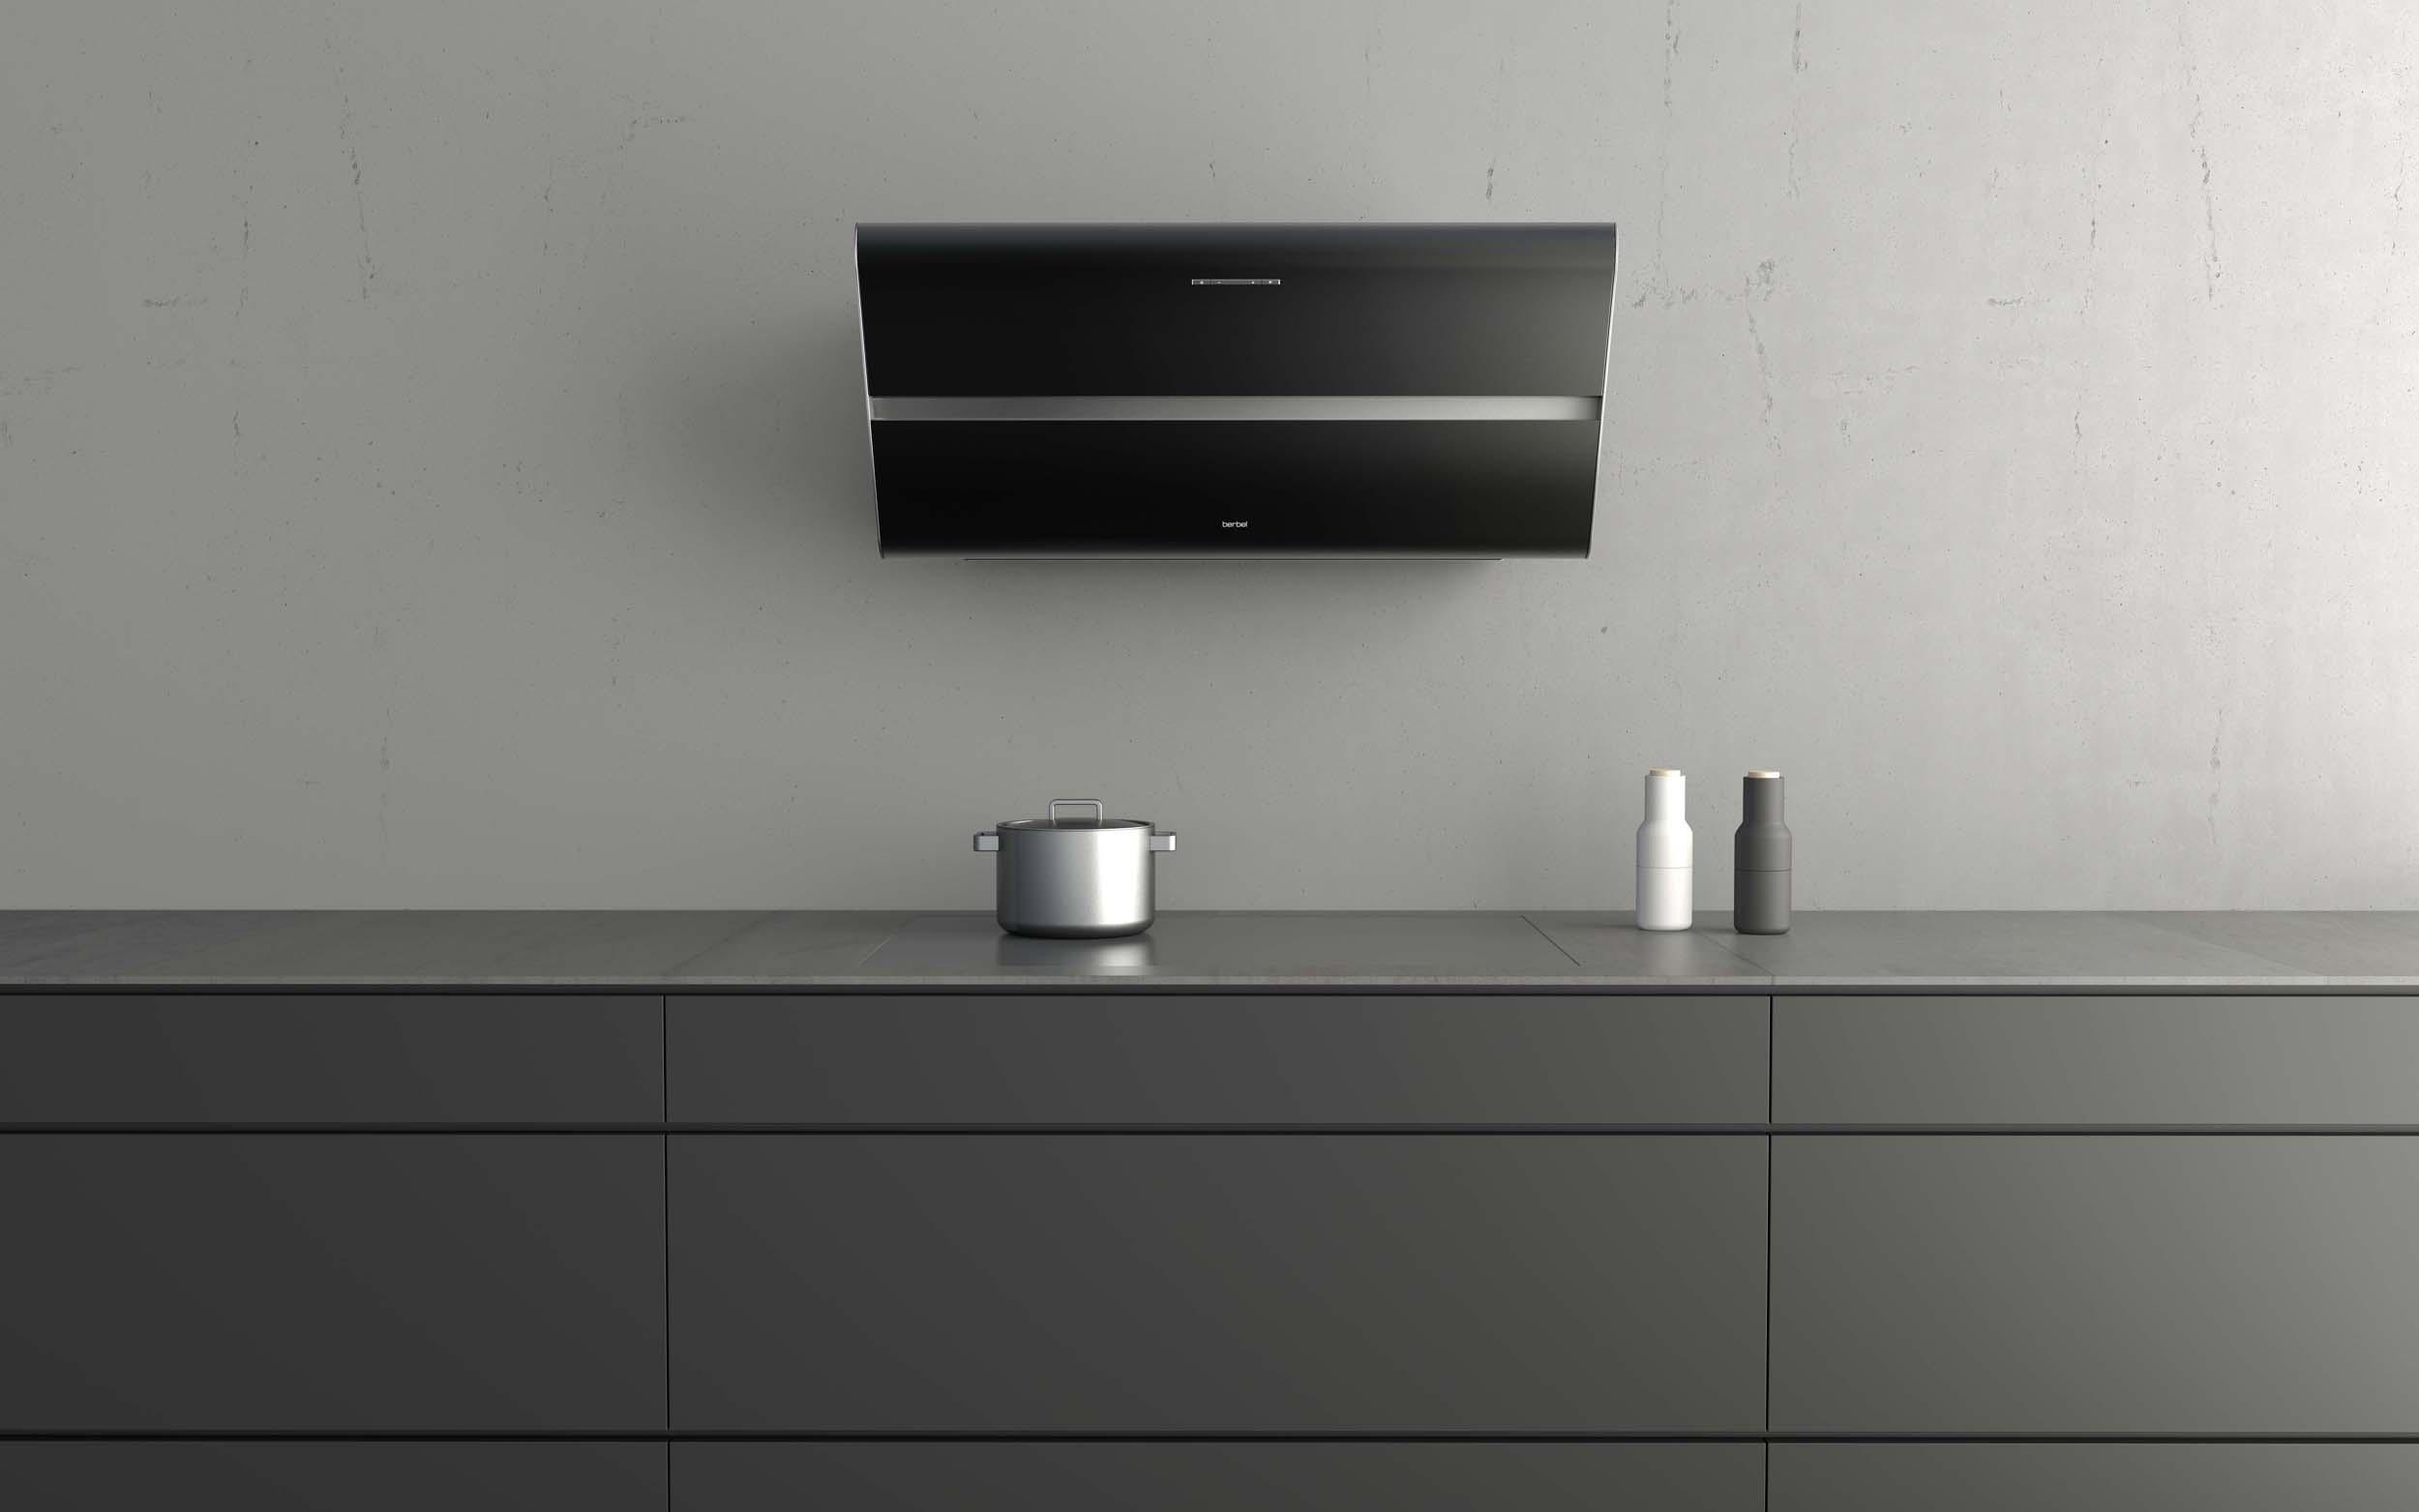 leistungsstarke dunstabz ge ohne kamin. Black Bedroom Furniture Sets. Home Design Ideas